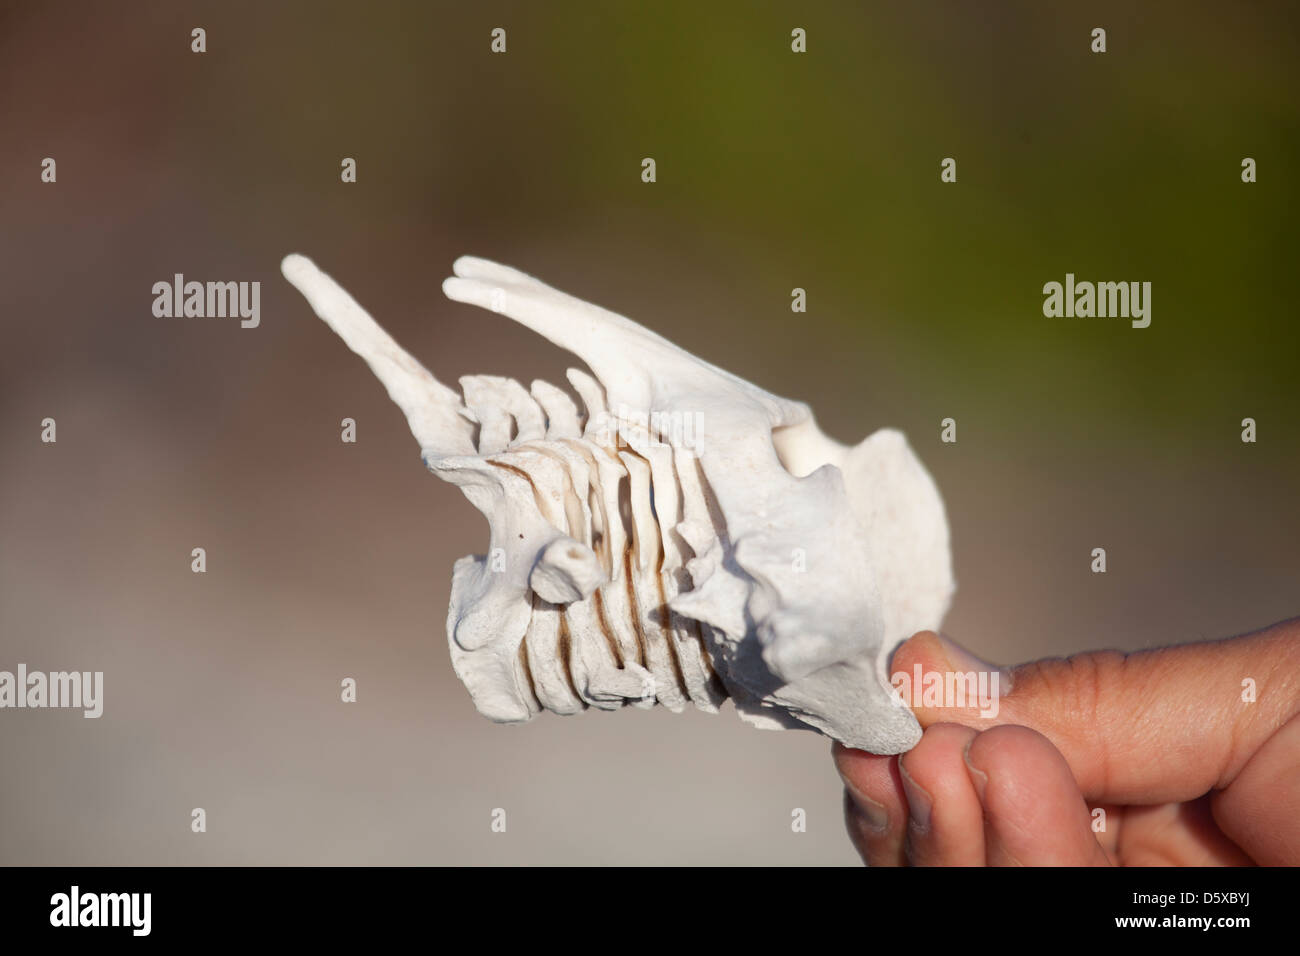 Seven intact dolphin neck vertebrae. - Stock Image